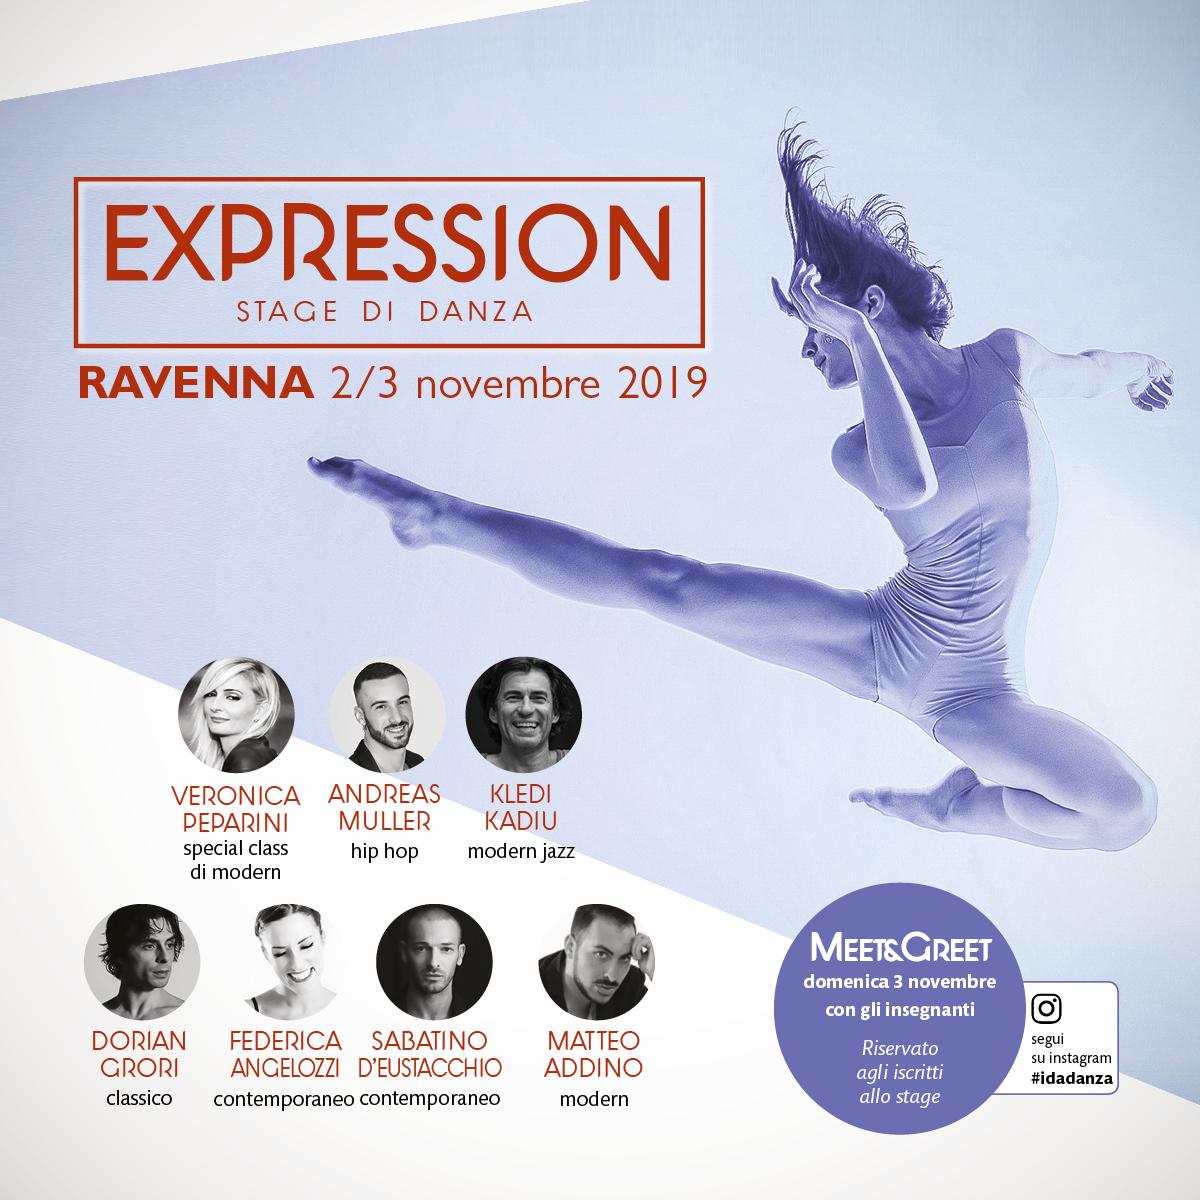 stage expression 2019 ravenna